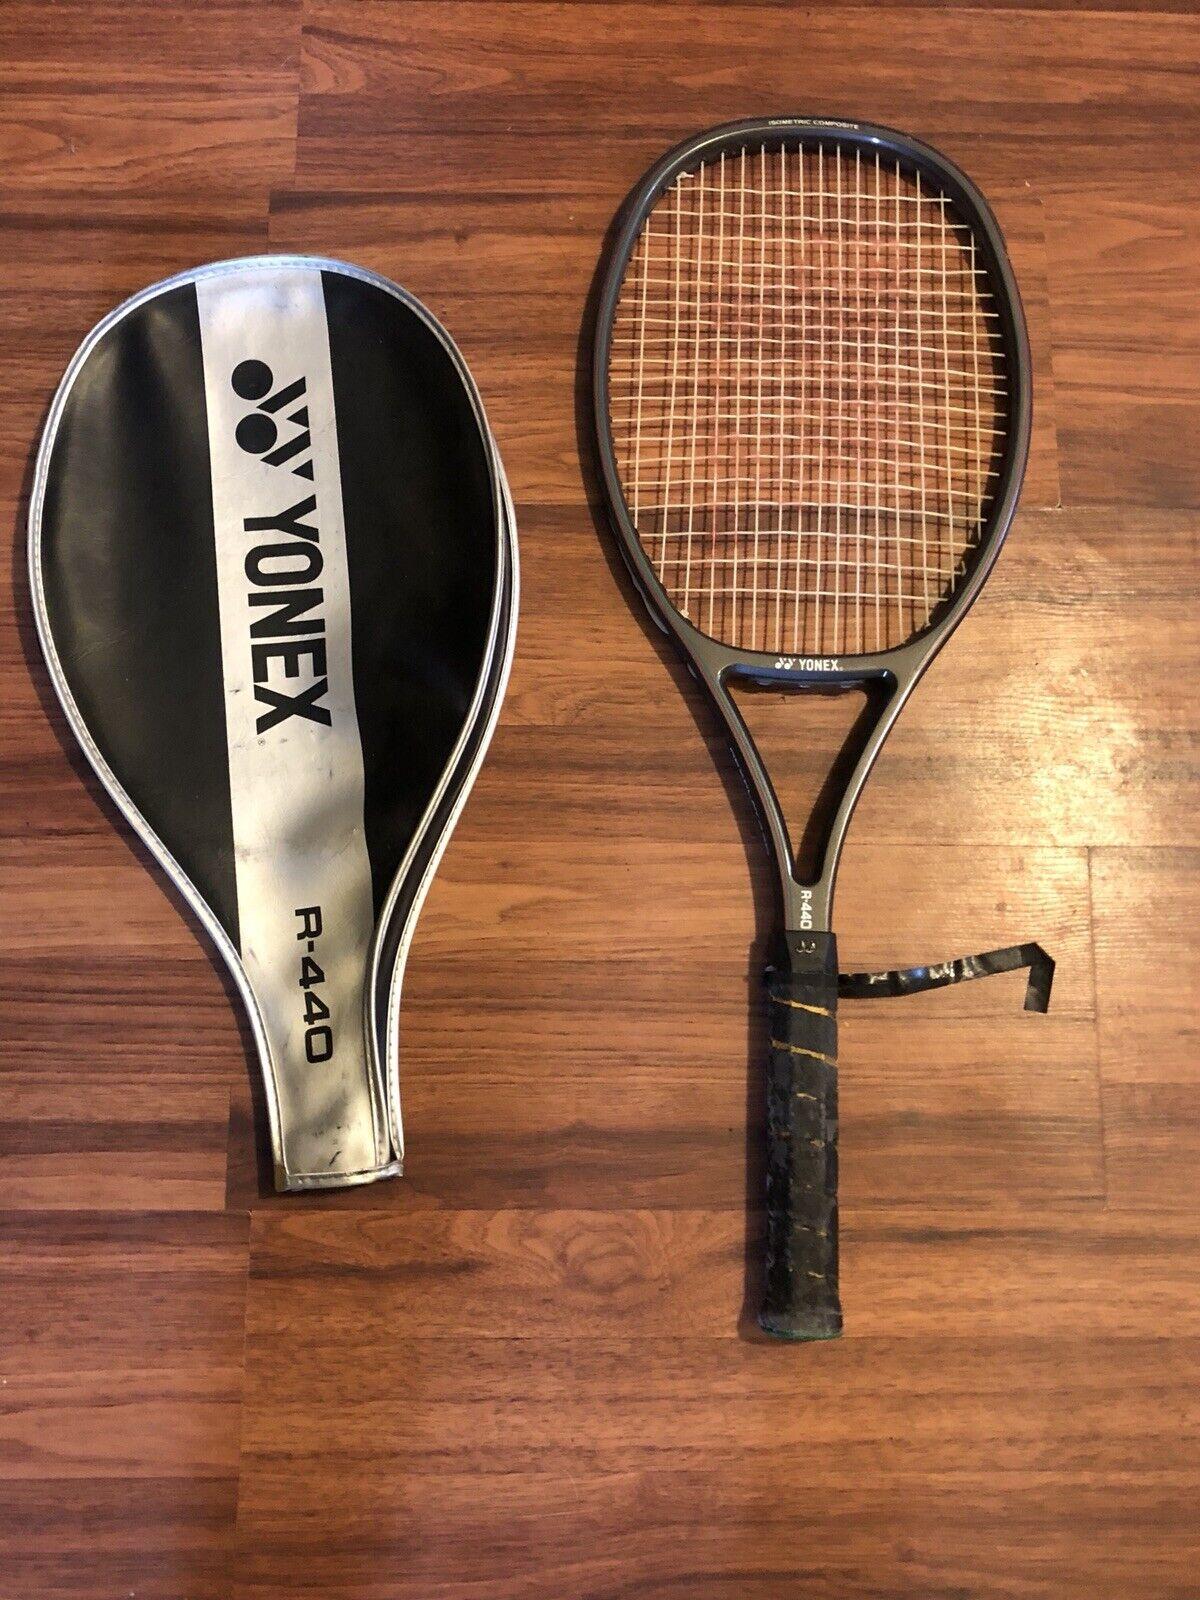 Yonex Rexplay 440 Isometric Composite R-440 Tennis Racquet 4 5 8 W  Cover Case